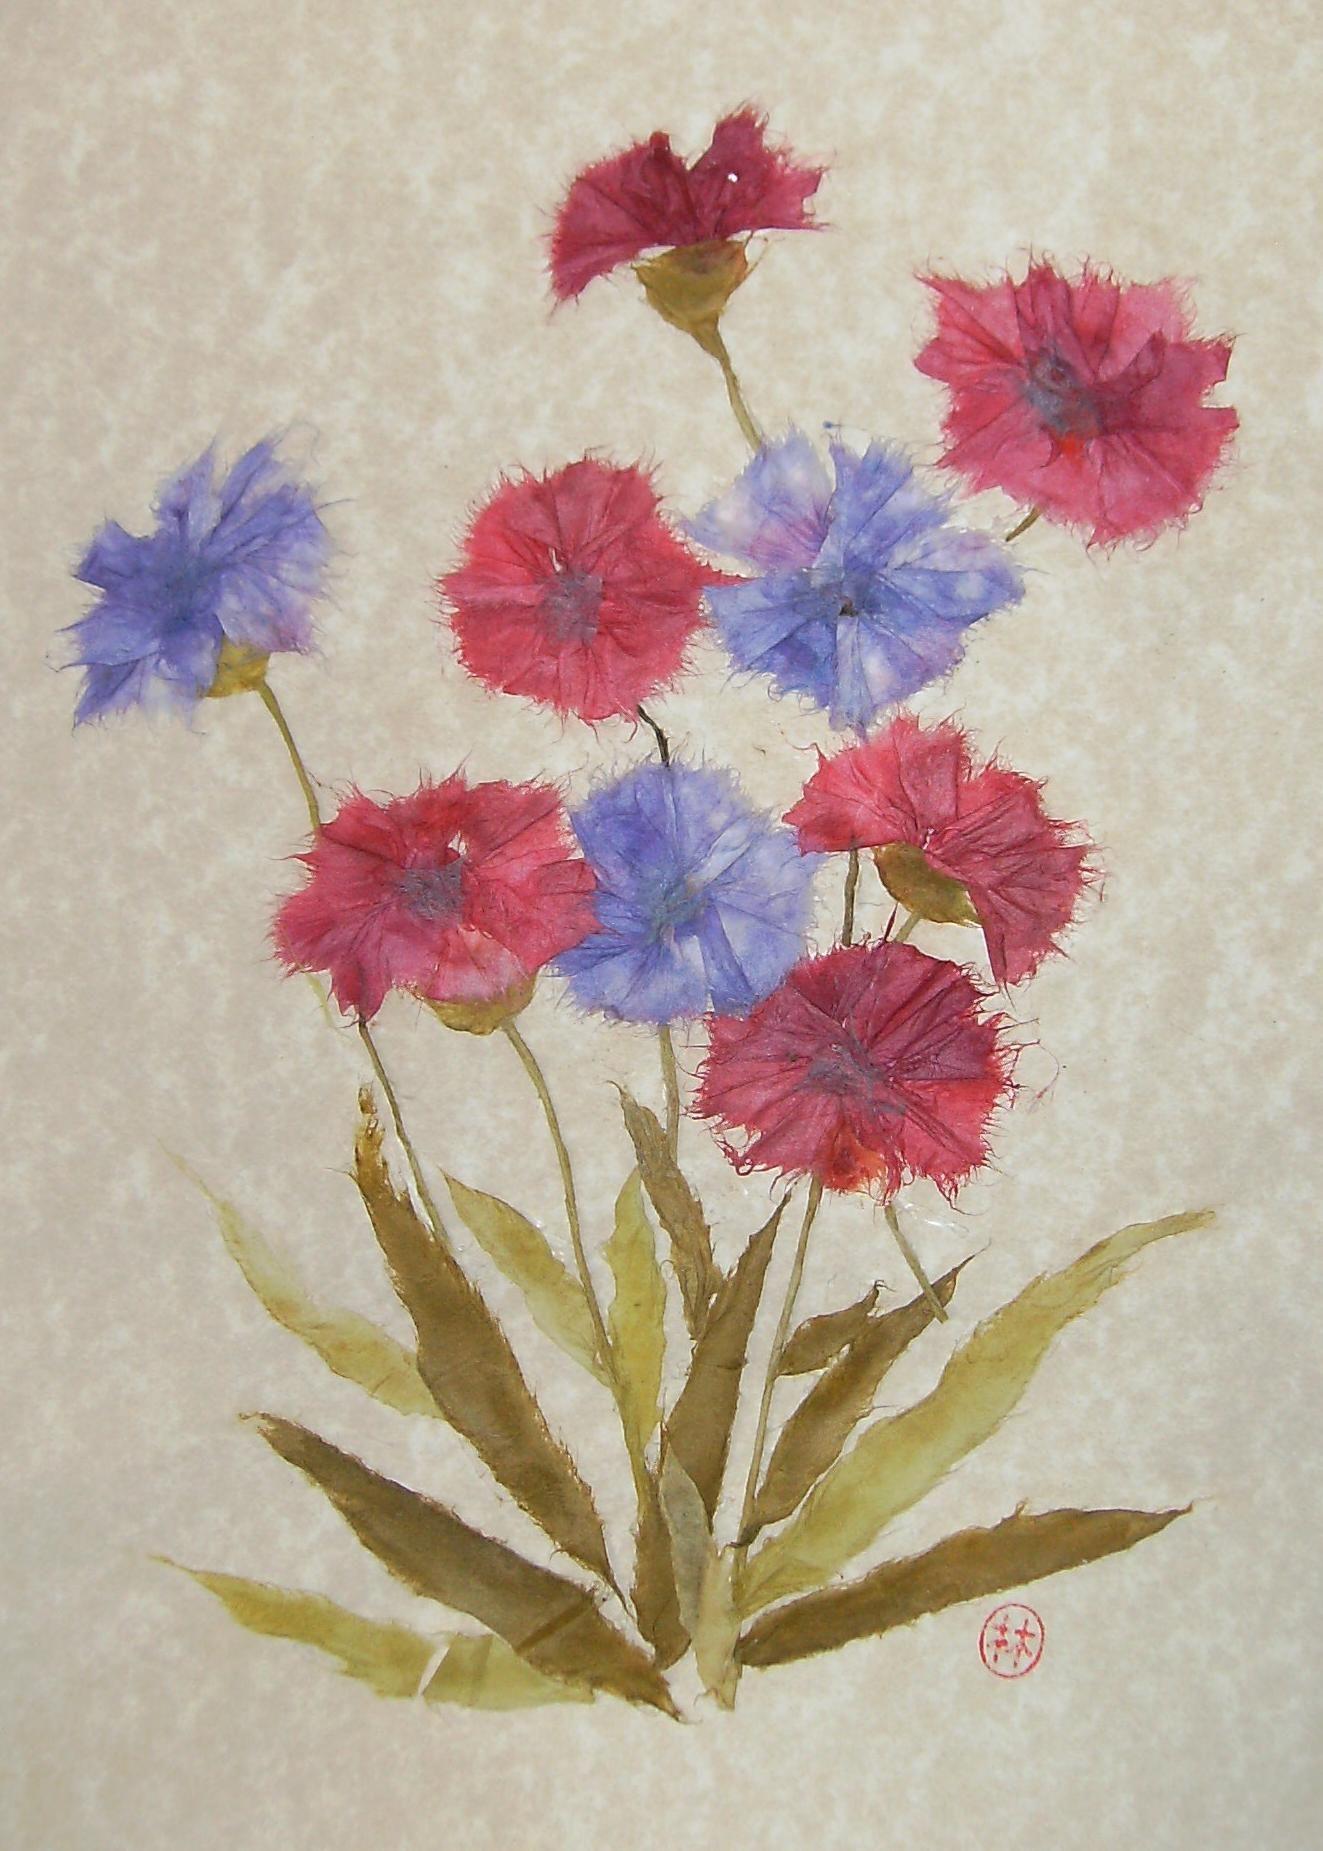 Paper Art Torn Paper Art Wild Flowers Chigiri E Art Paper